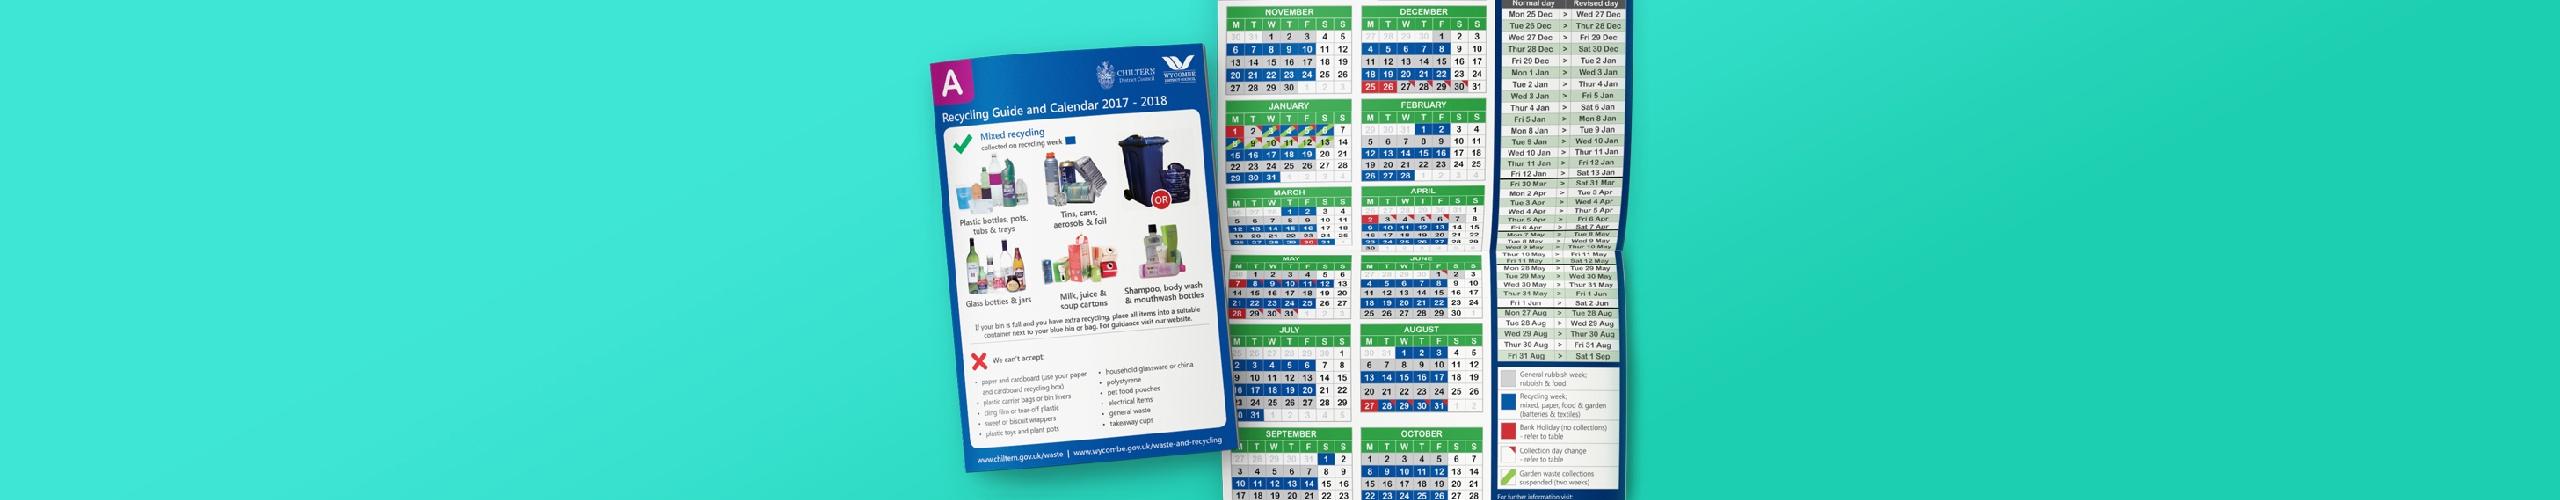 New Waste Calendar 2017 - 2018